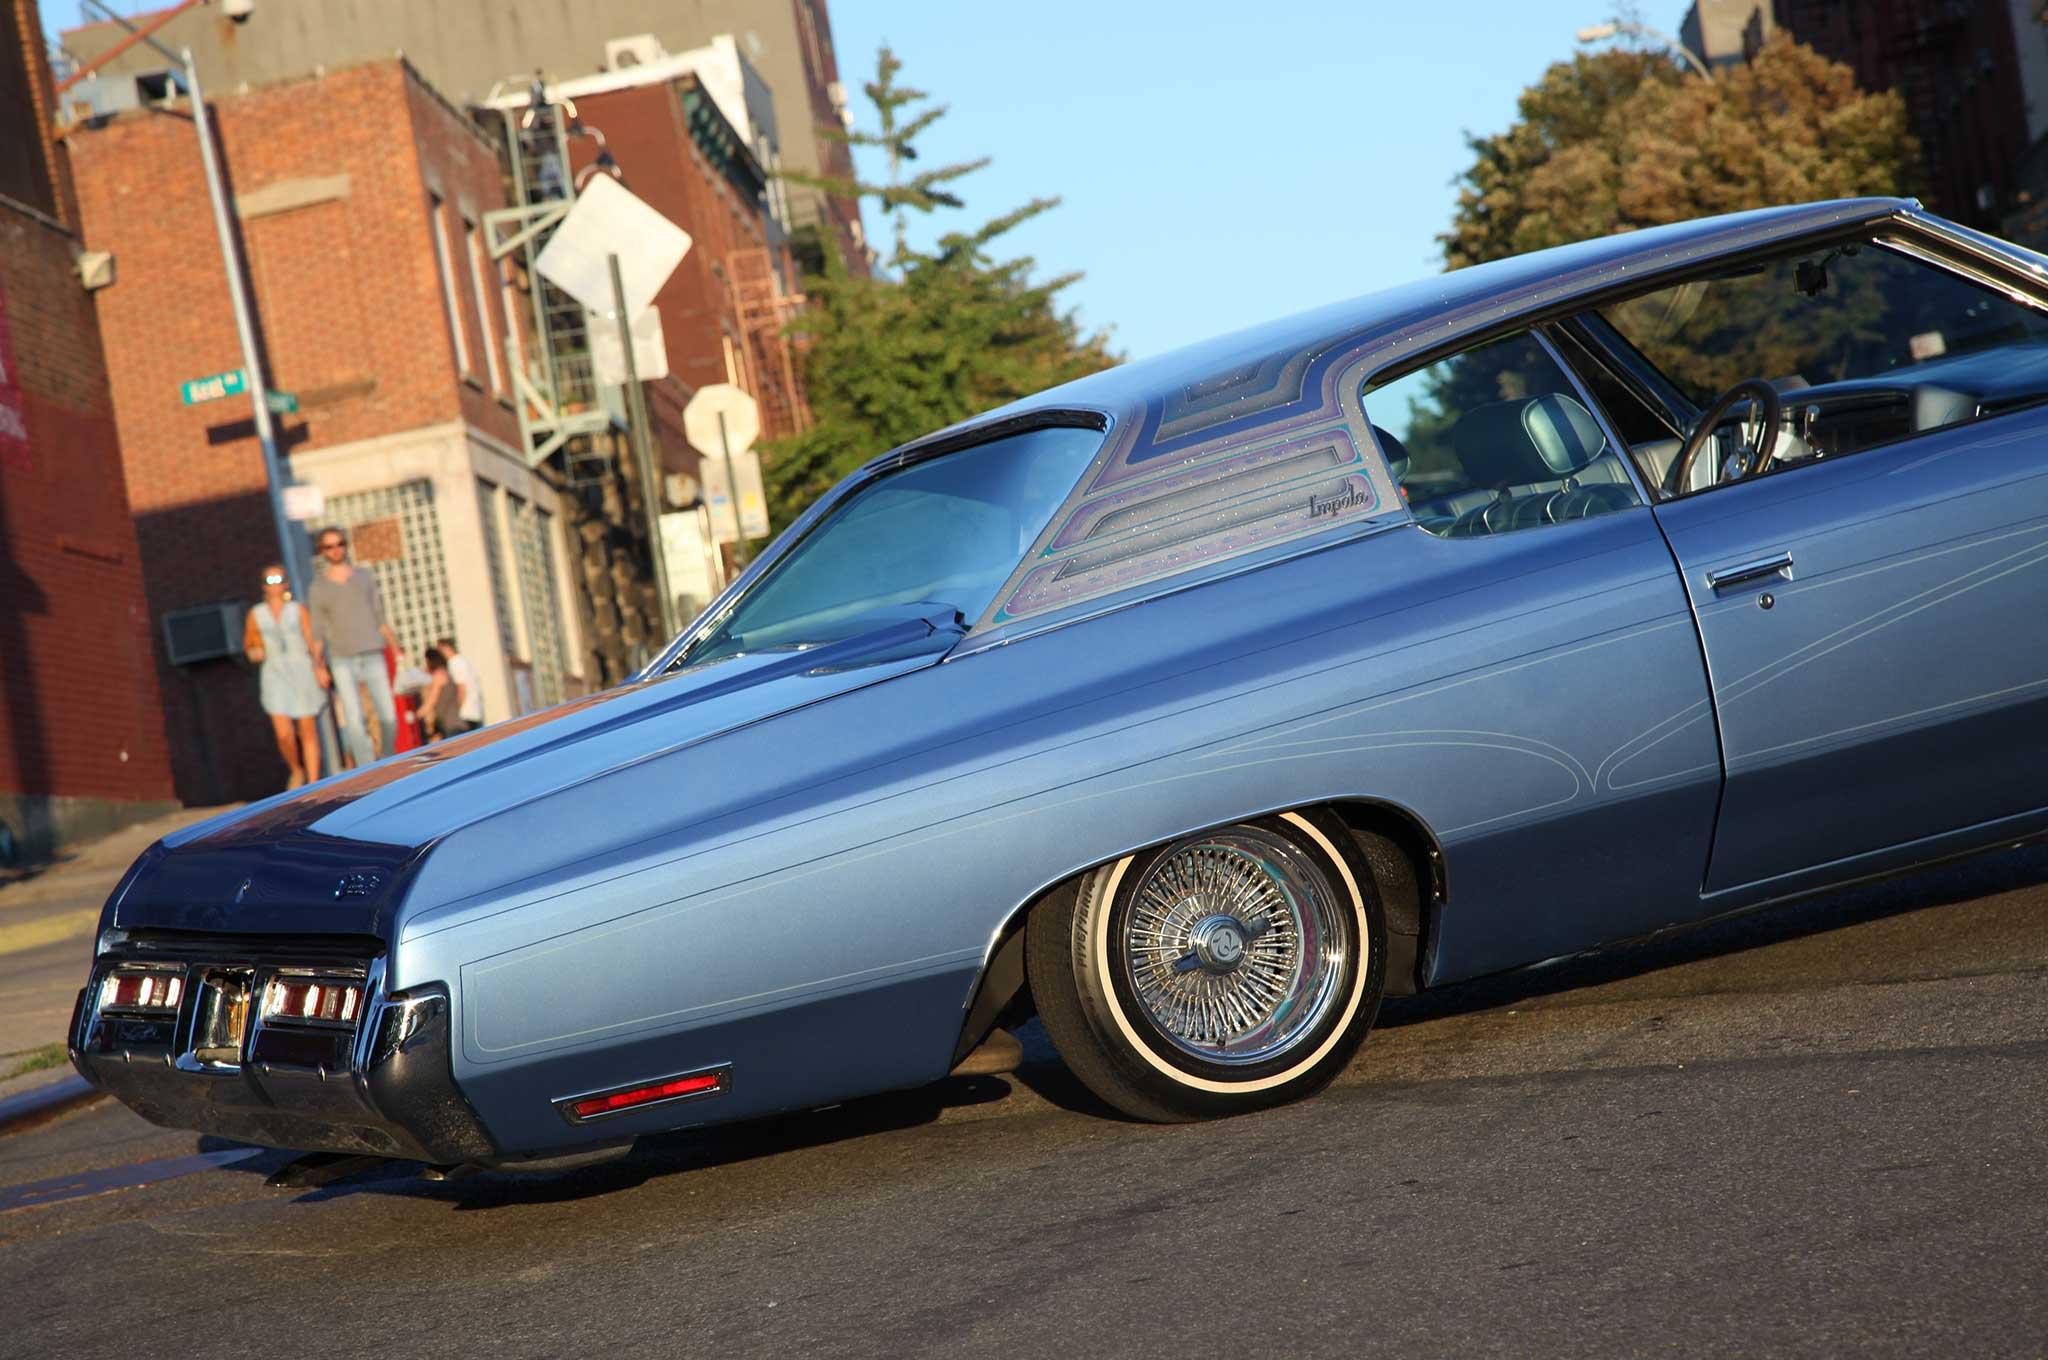 A 72 Chevy Impala Thats LA Built For NY Riding